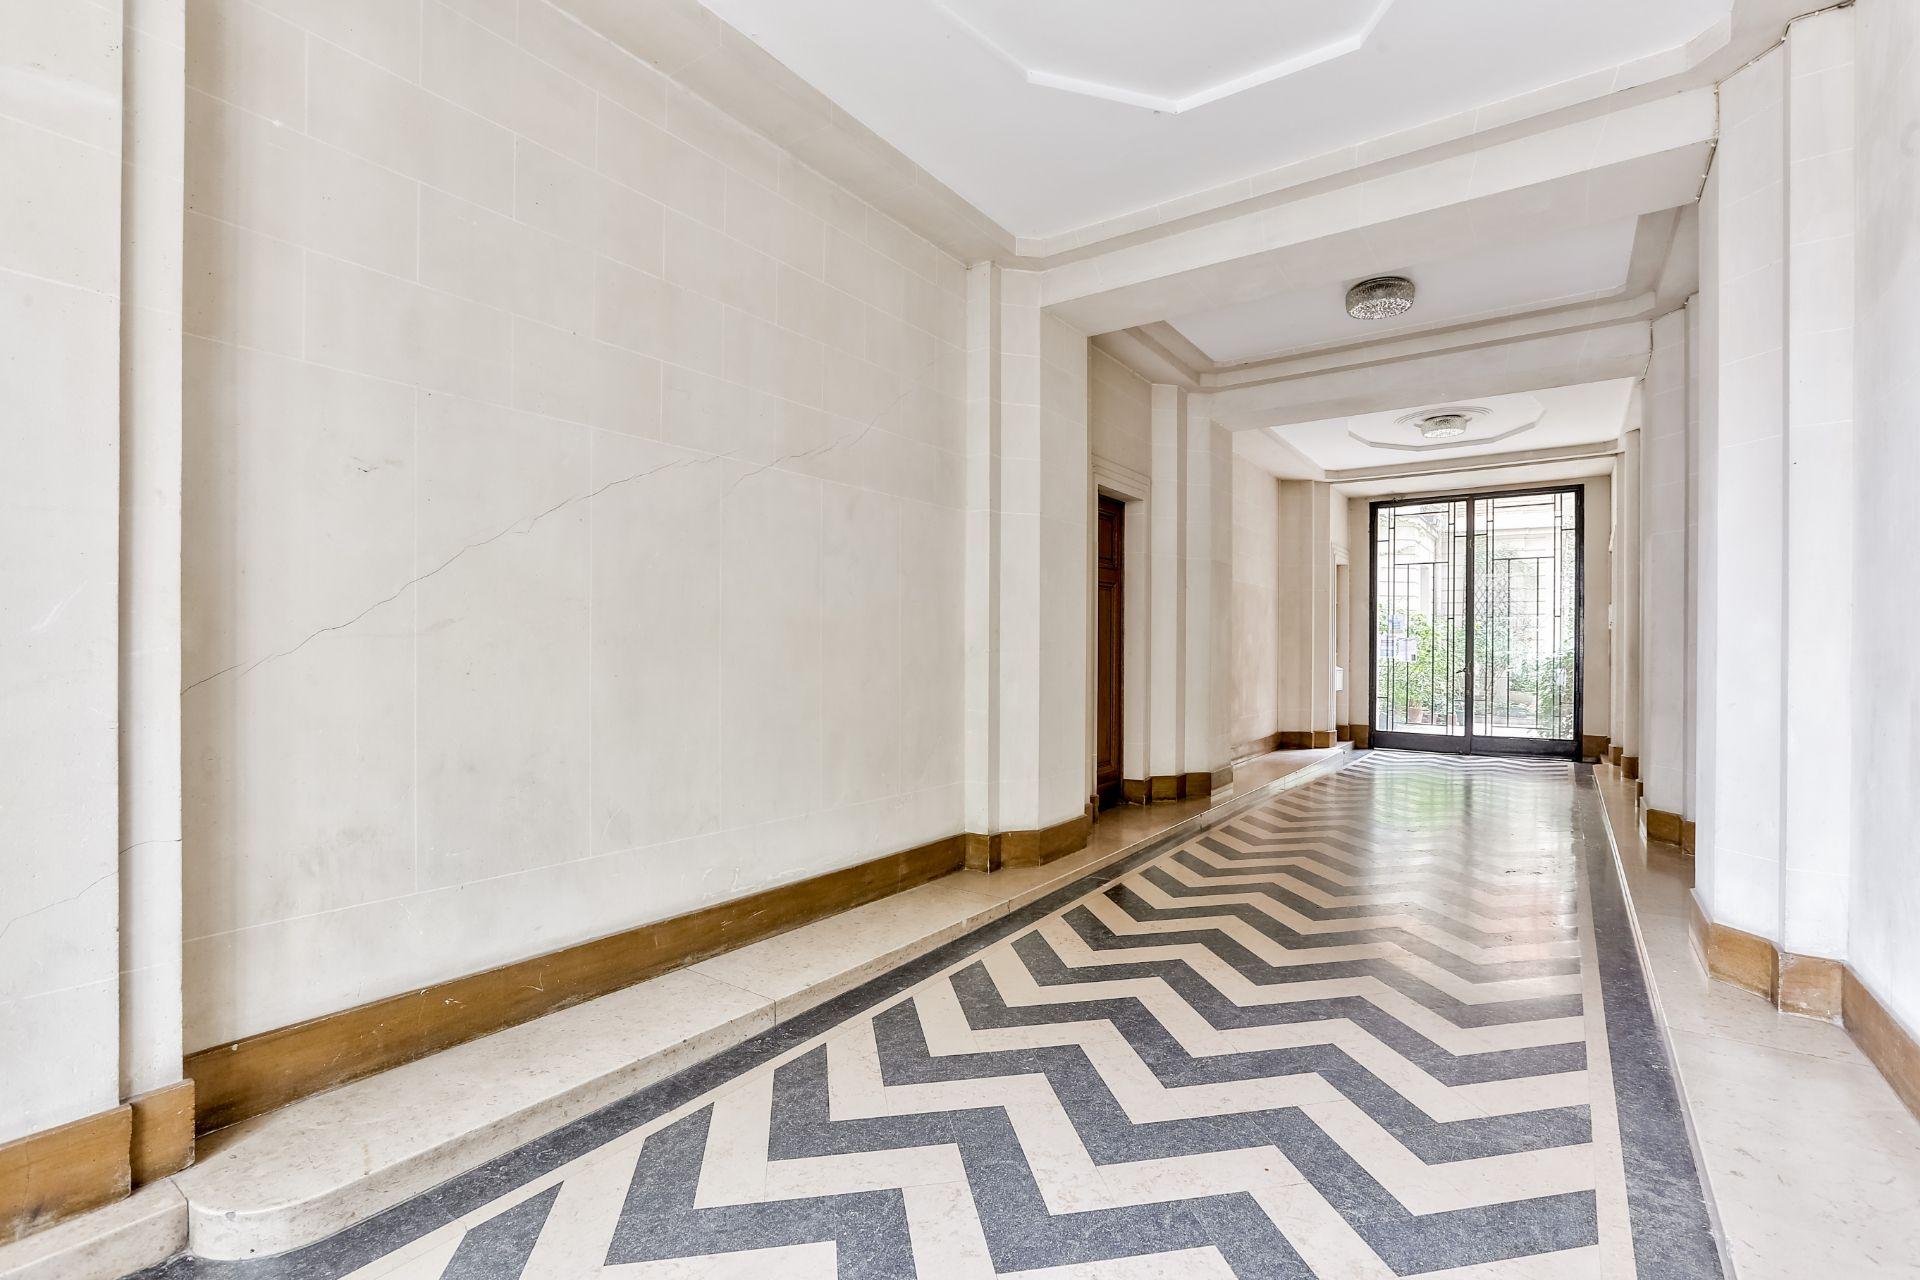 Boulevard Barbès – Very nice 3/4 room apartment of 90.9 m2 8